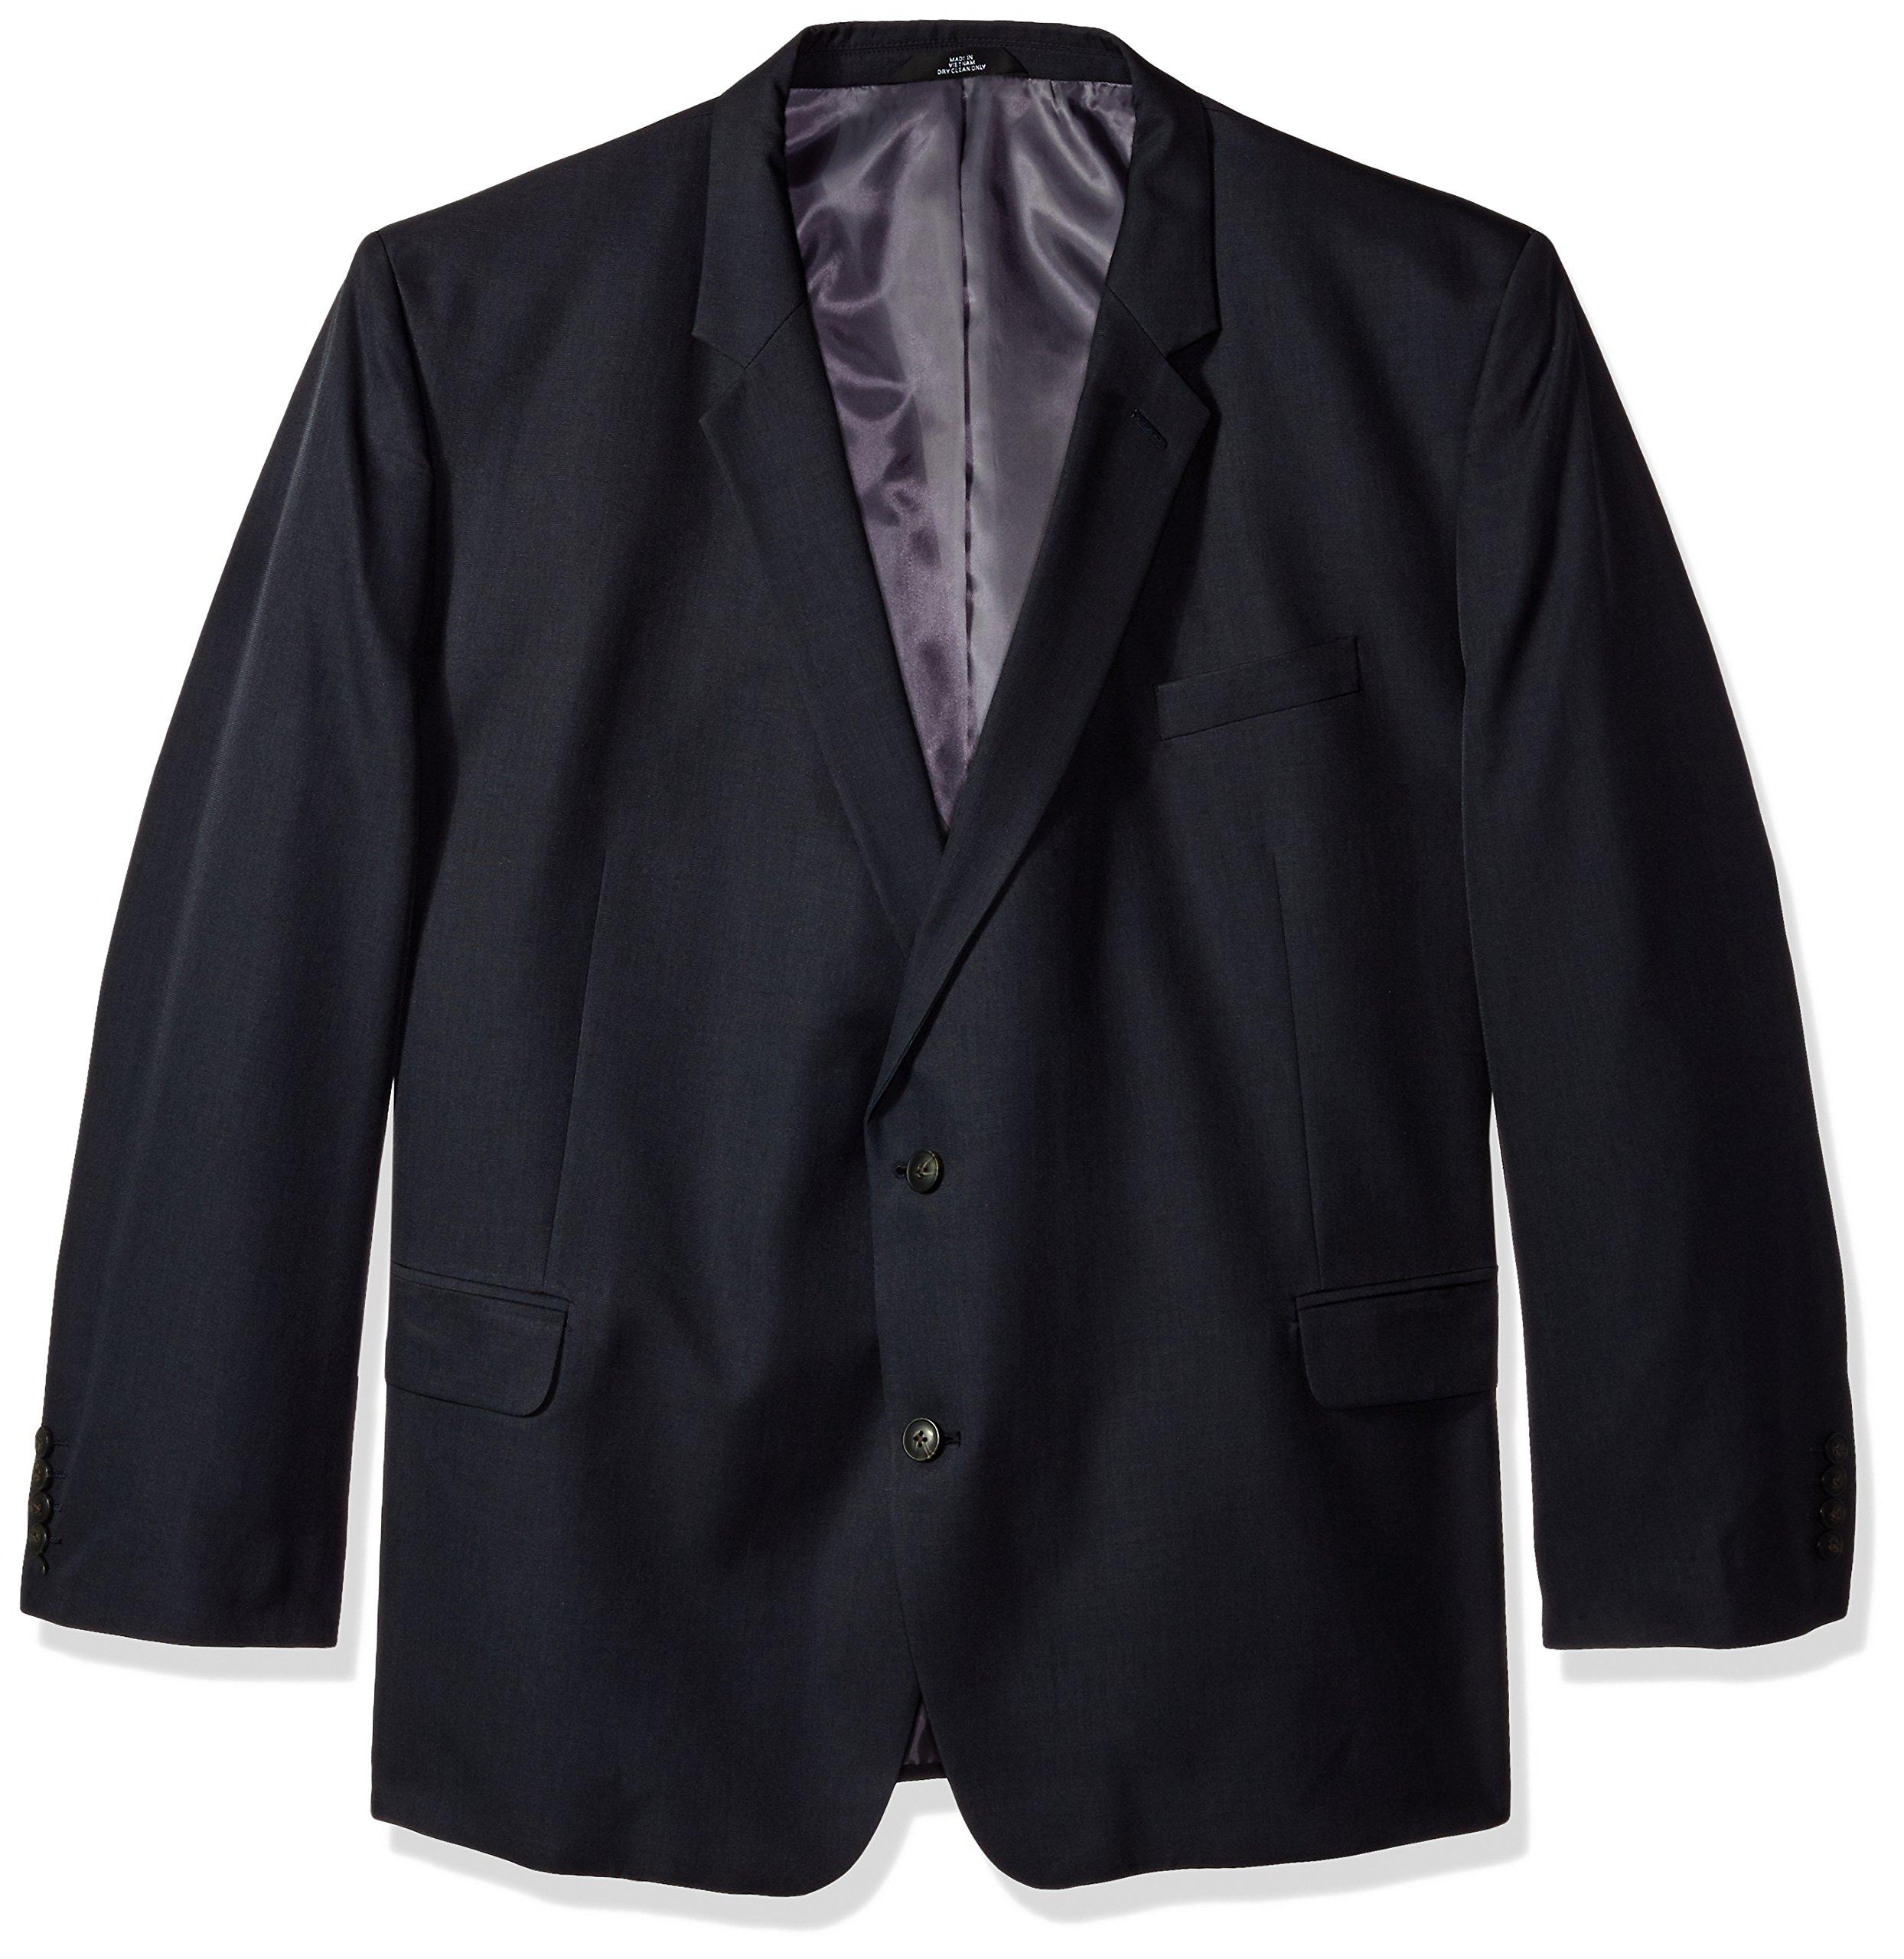 J.M. Haggar Men's Big and Tall Premium Stretch Classic Fit 2-Button Coat, Dark Navy, 54R